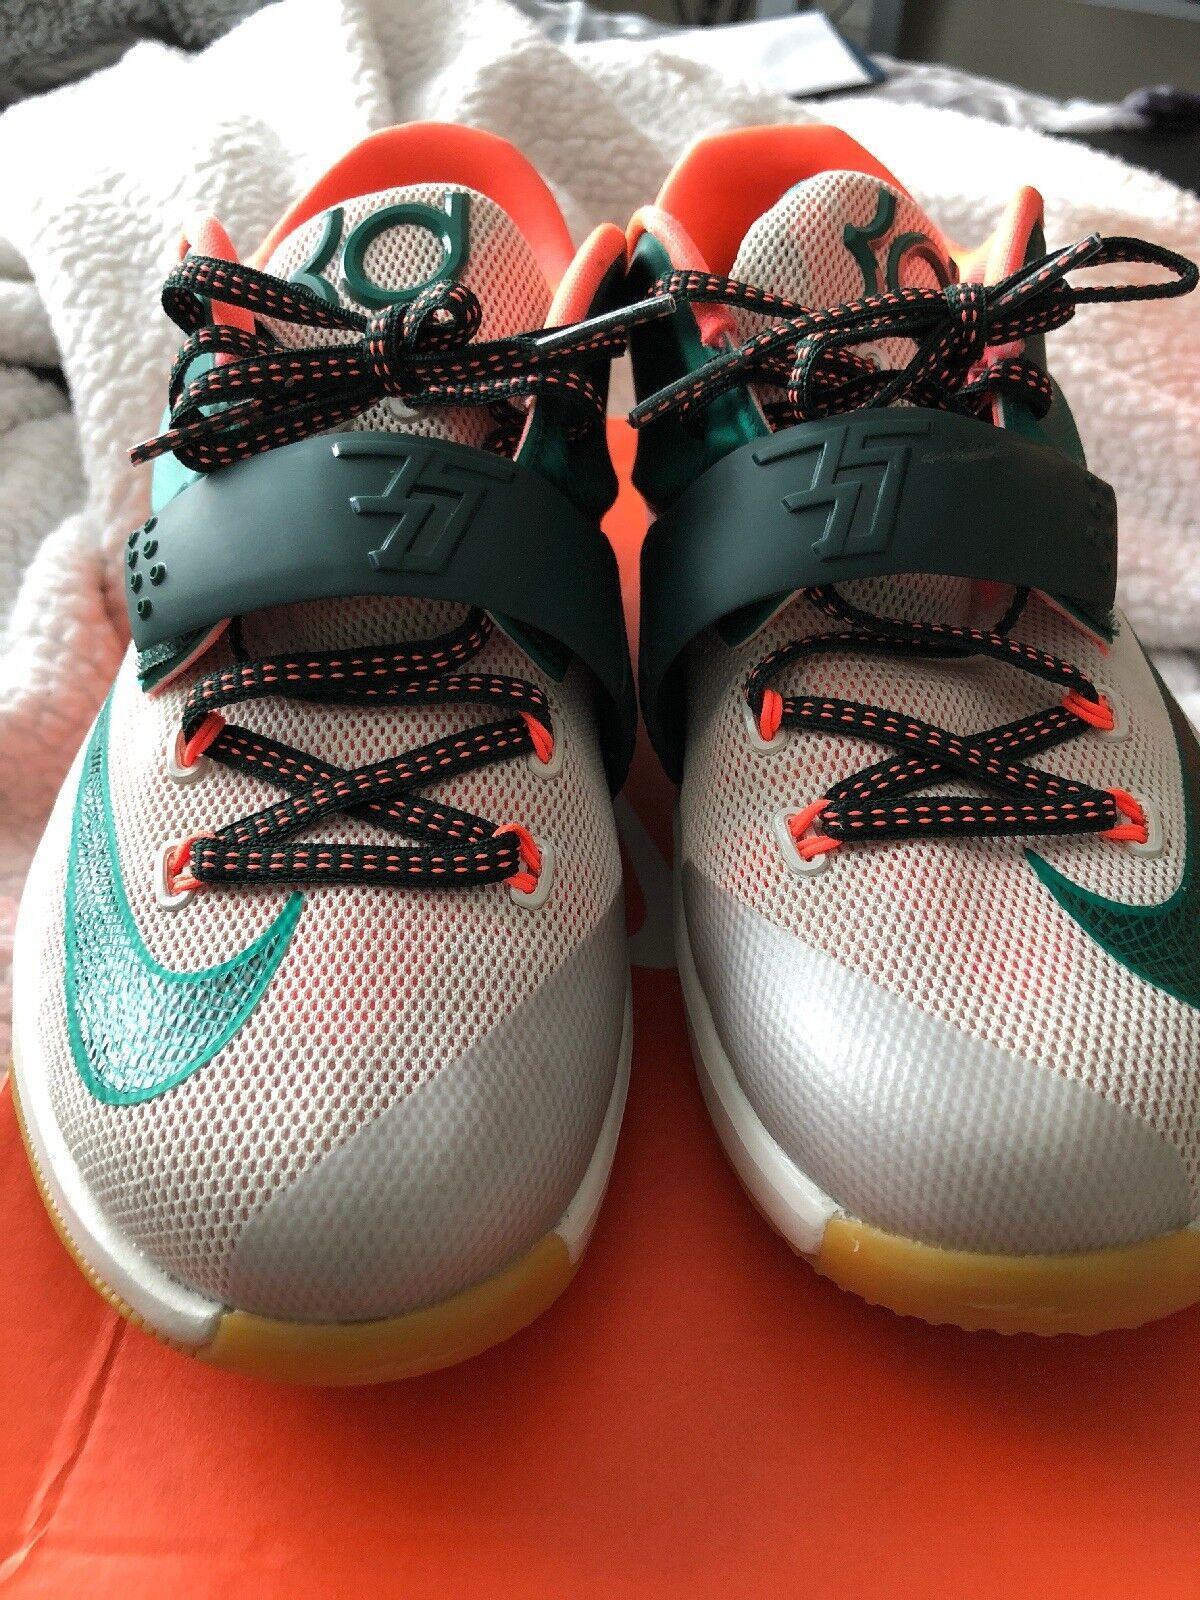 huge discount 77e1c e6fe5 ... Nike Kd 7 Gs Mystic Mystic Mystic Green Size 5y b39344 ...